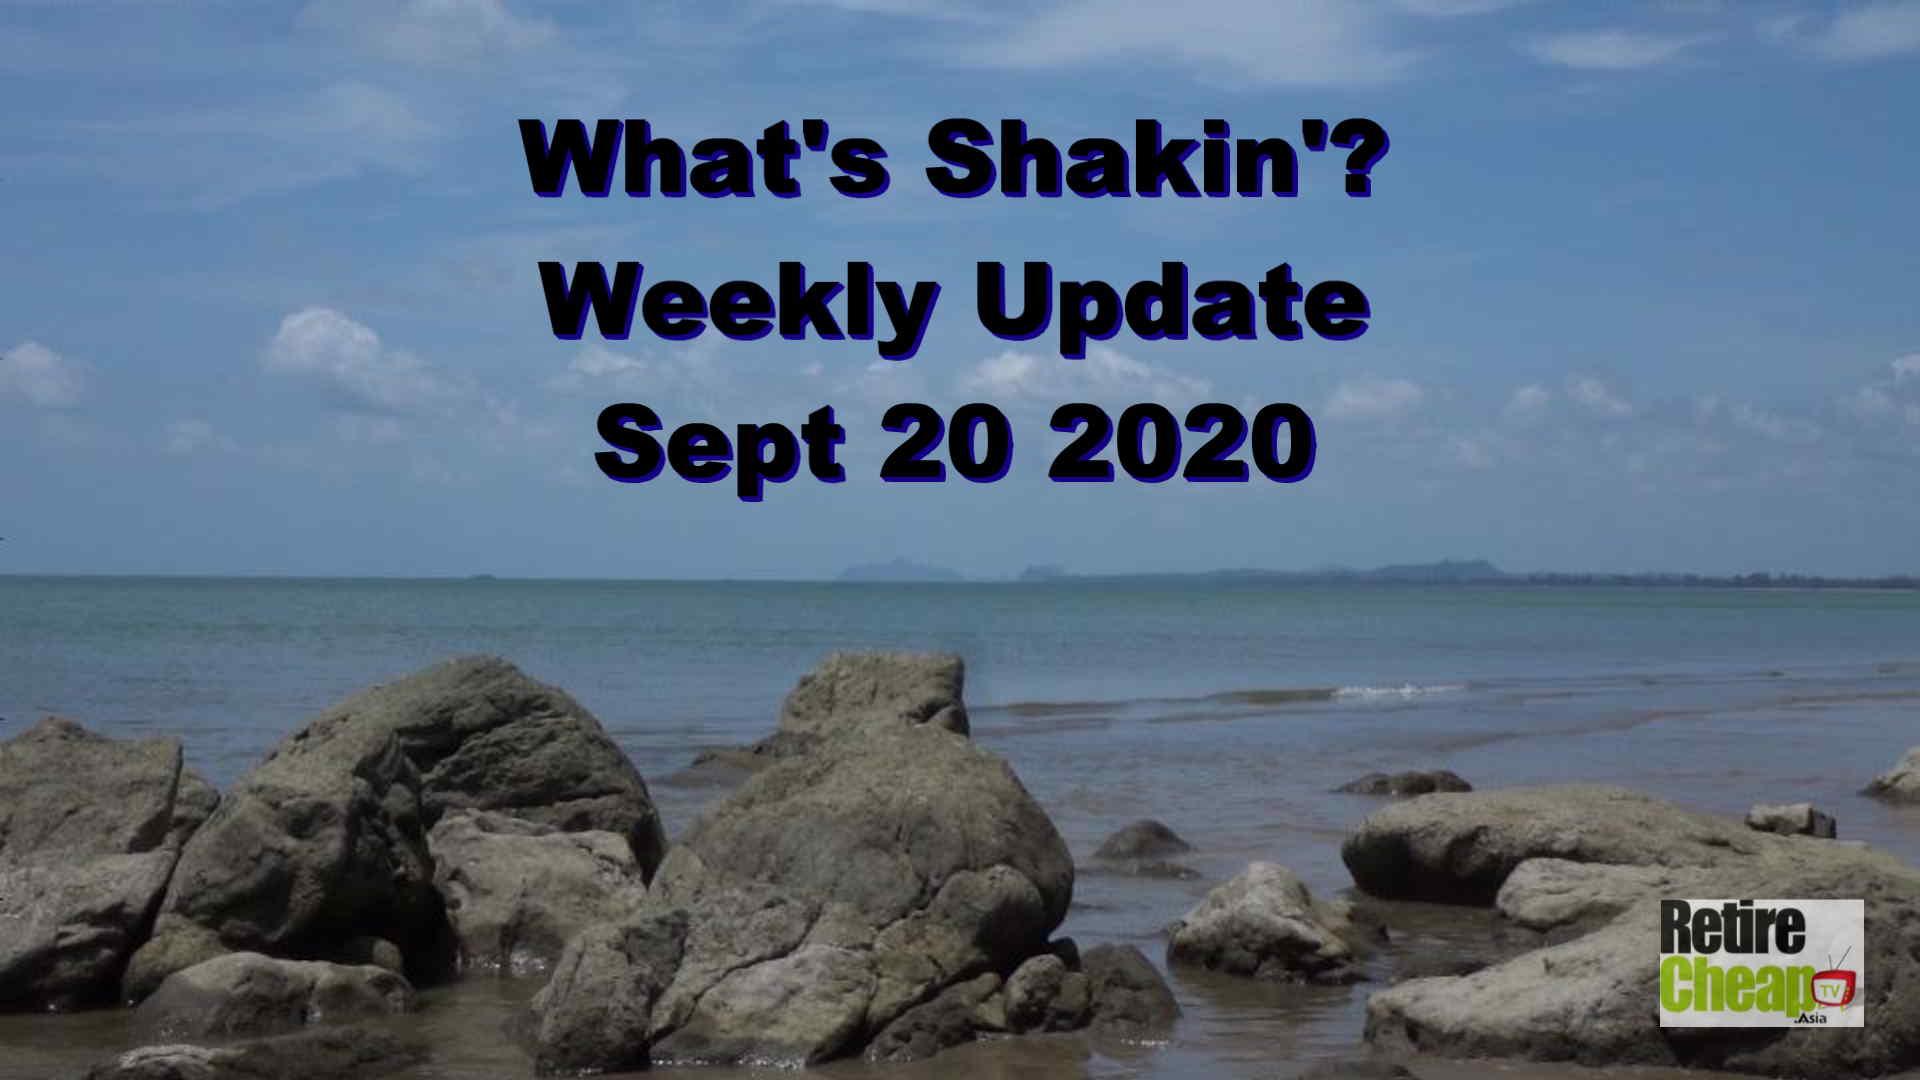 What's Shakn'? Week September 20 2020